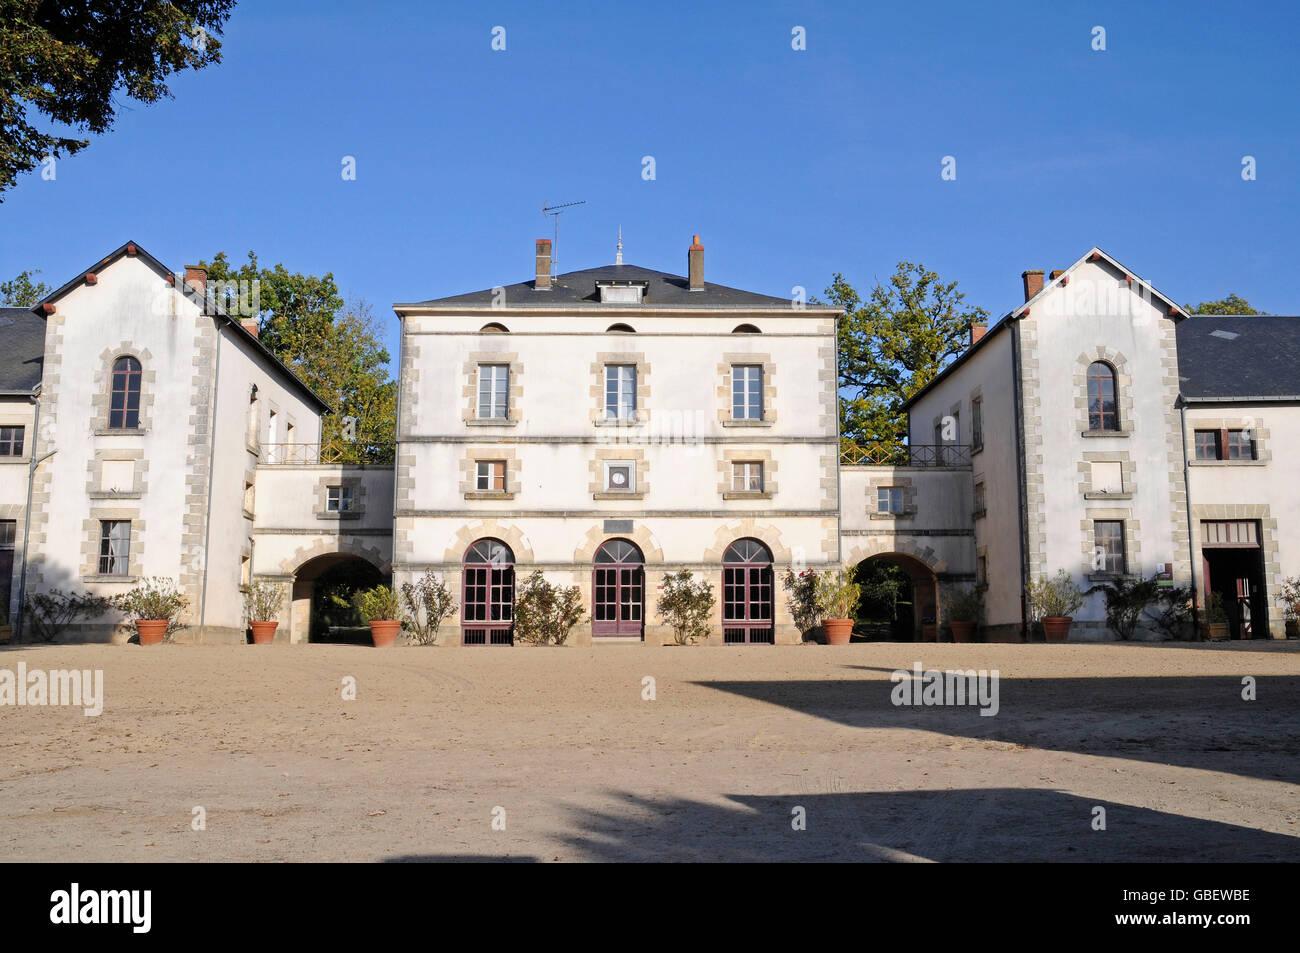 Delightful Haras National, Stud Farm, La Roche Sur Yon, Vendee, Pays